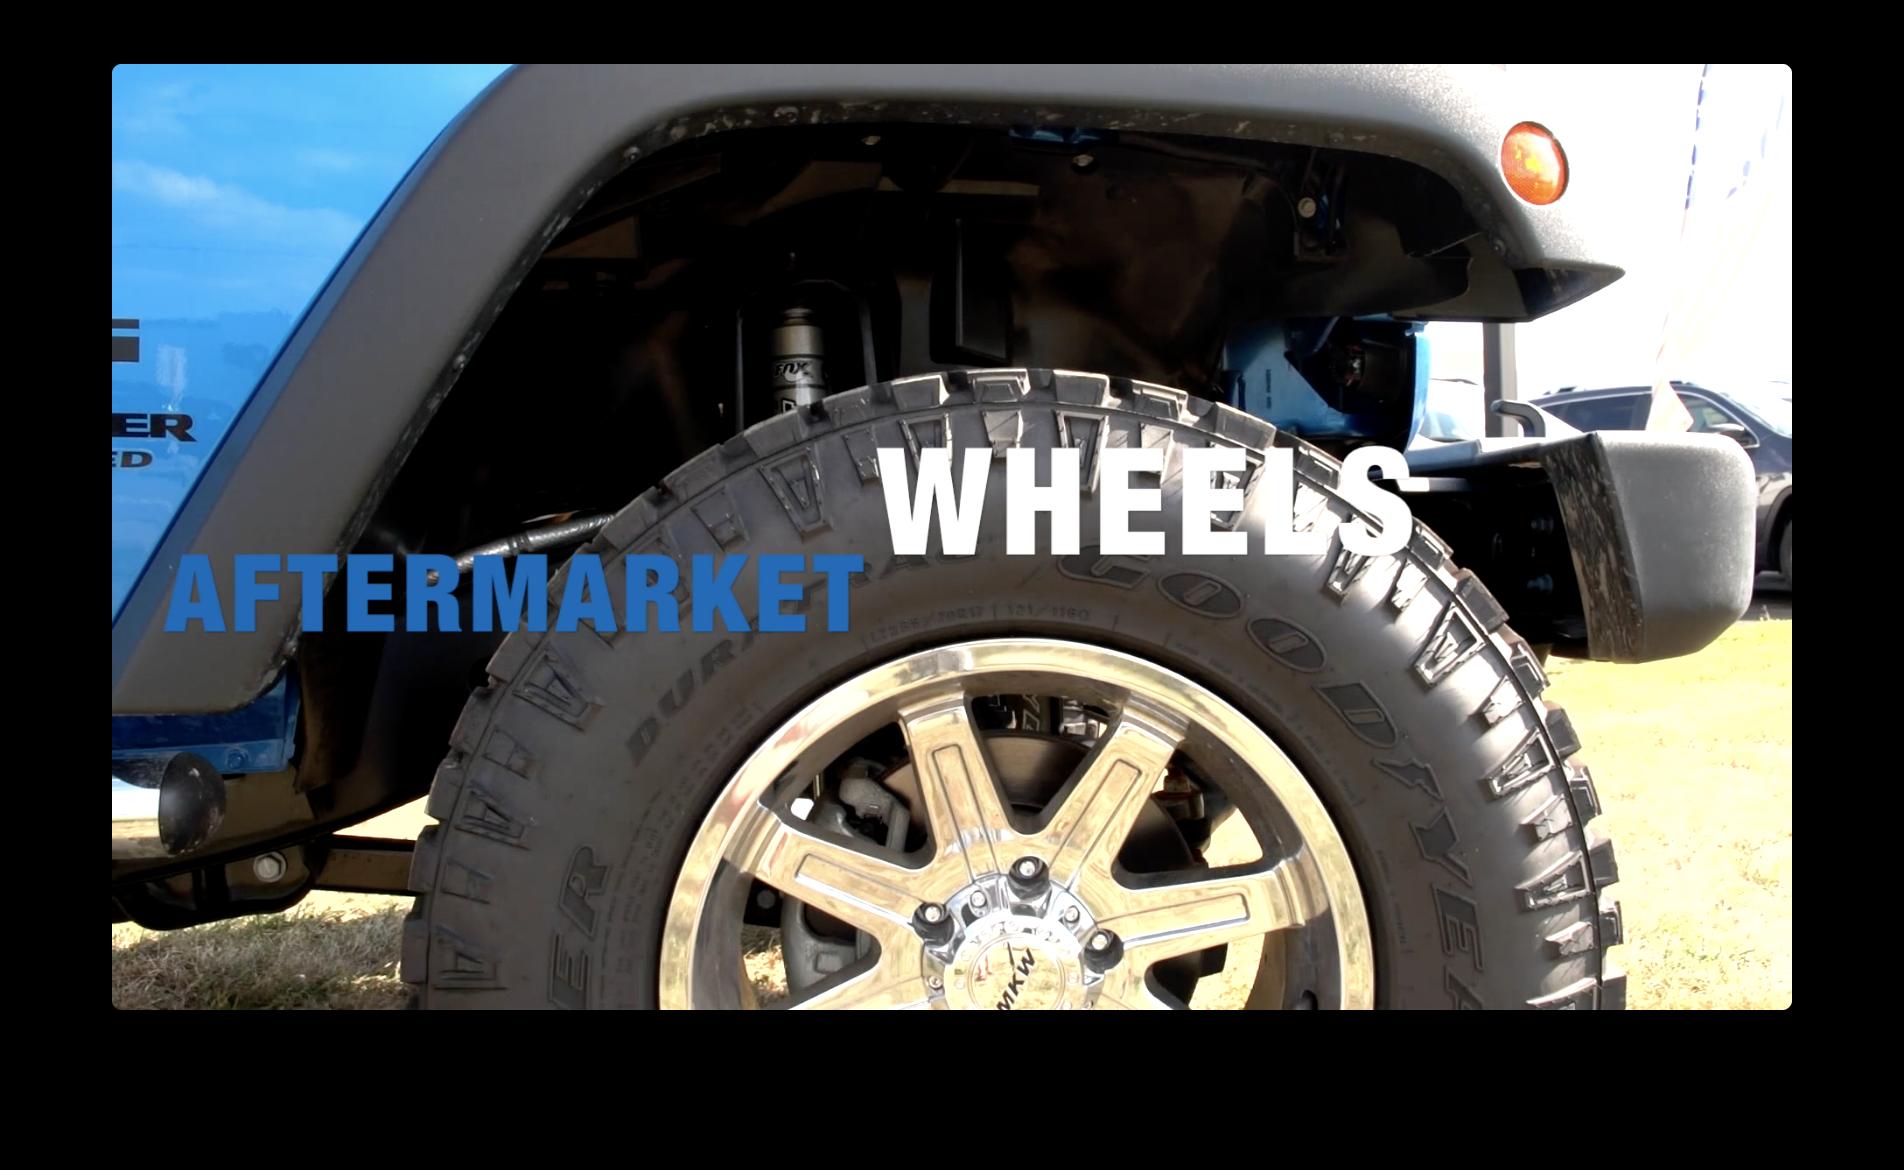 After Market Wheels